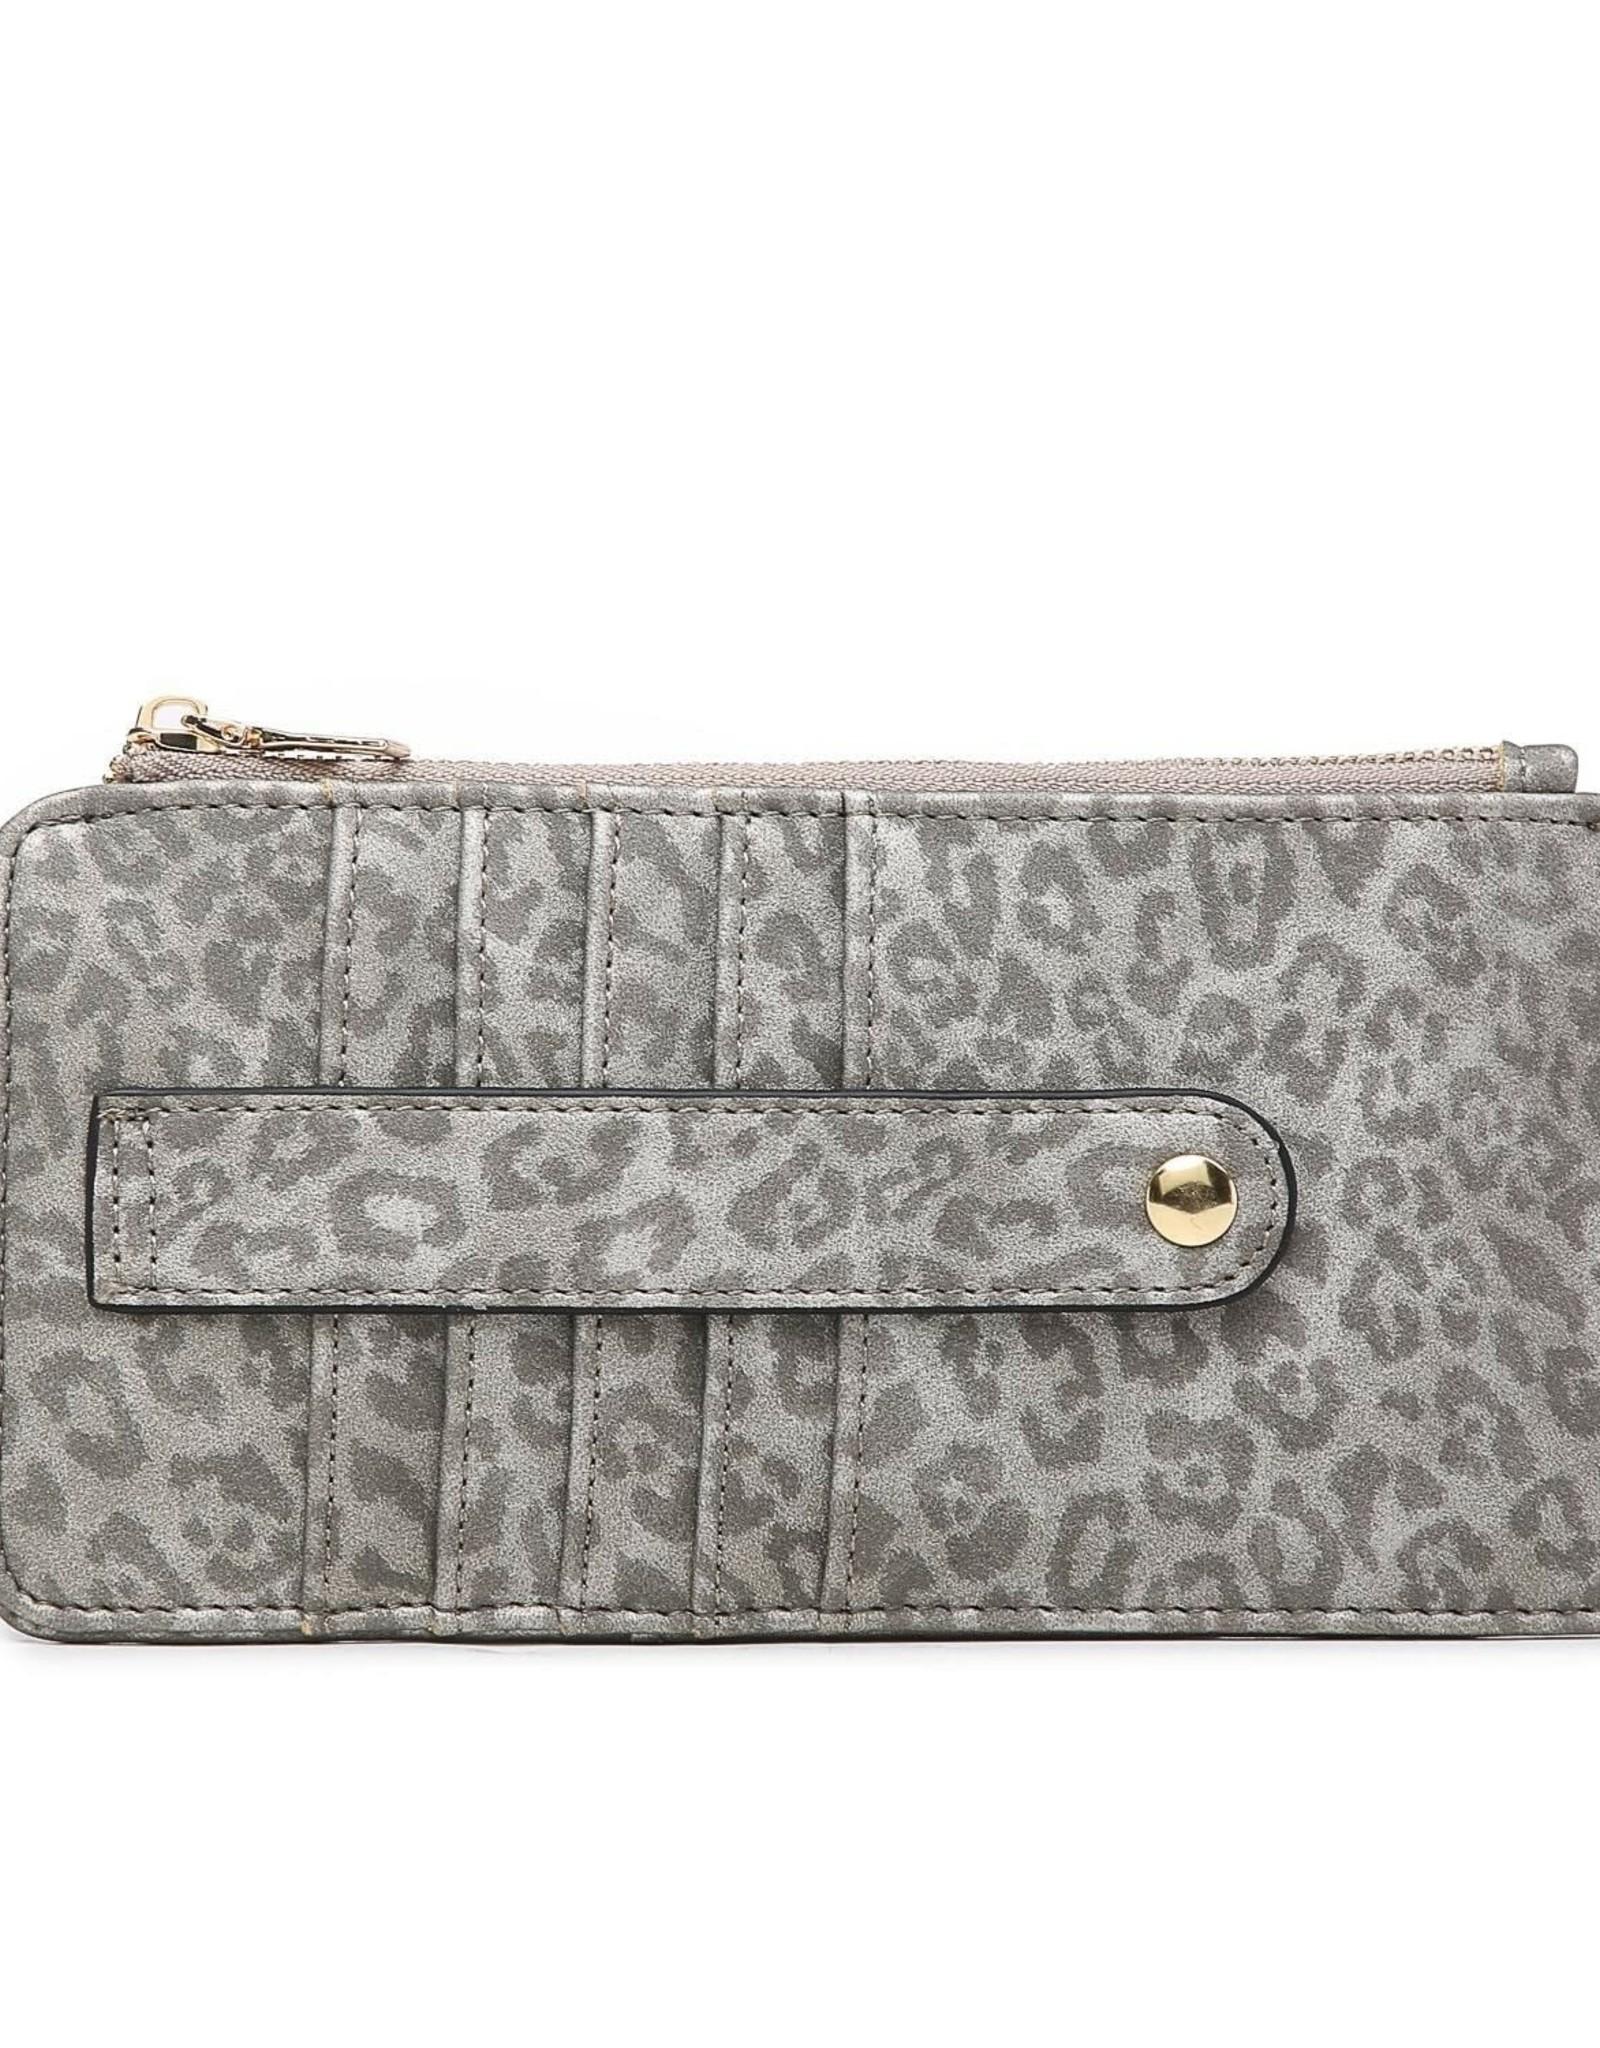 Jen & Co. Slim Wallet With Secured Card Slot